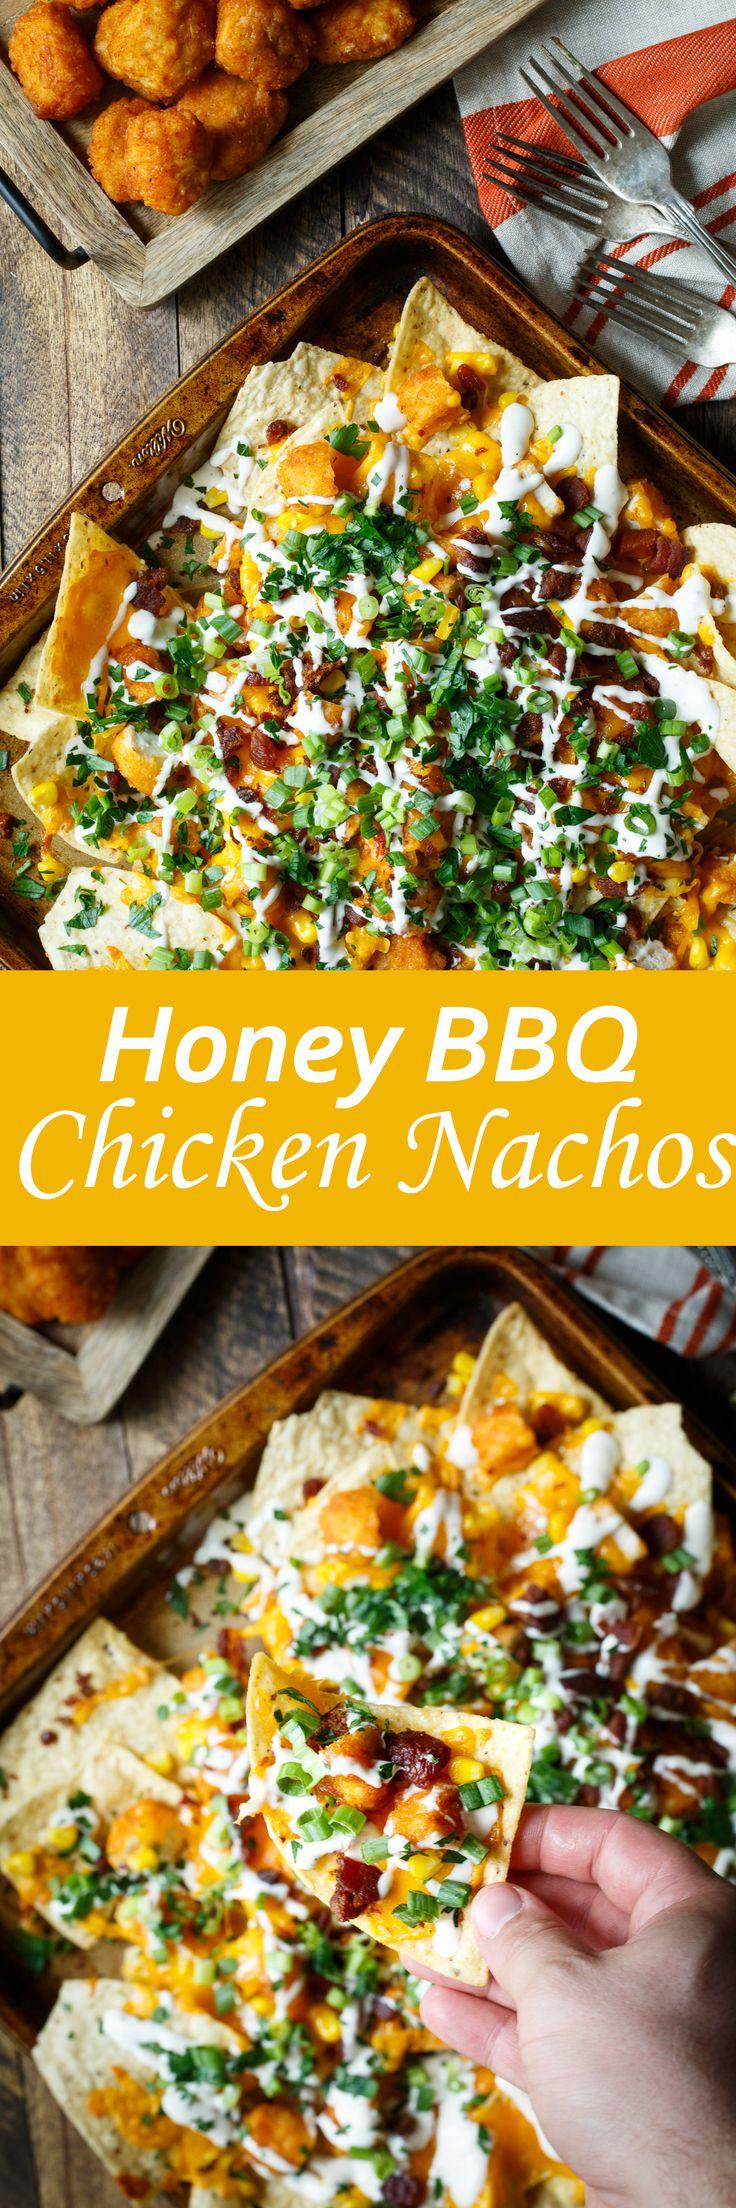 Honey BBQ Chicken Nachos recipe. A simple appetizer to make tonight.